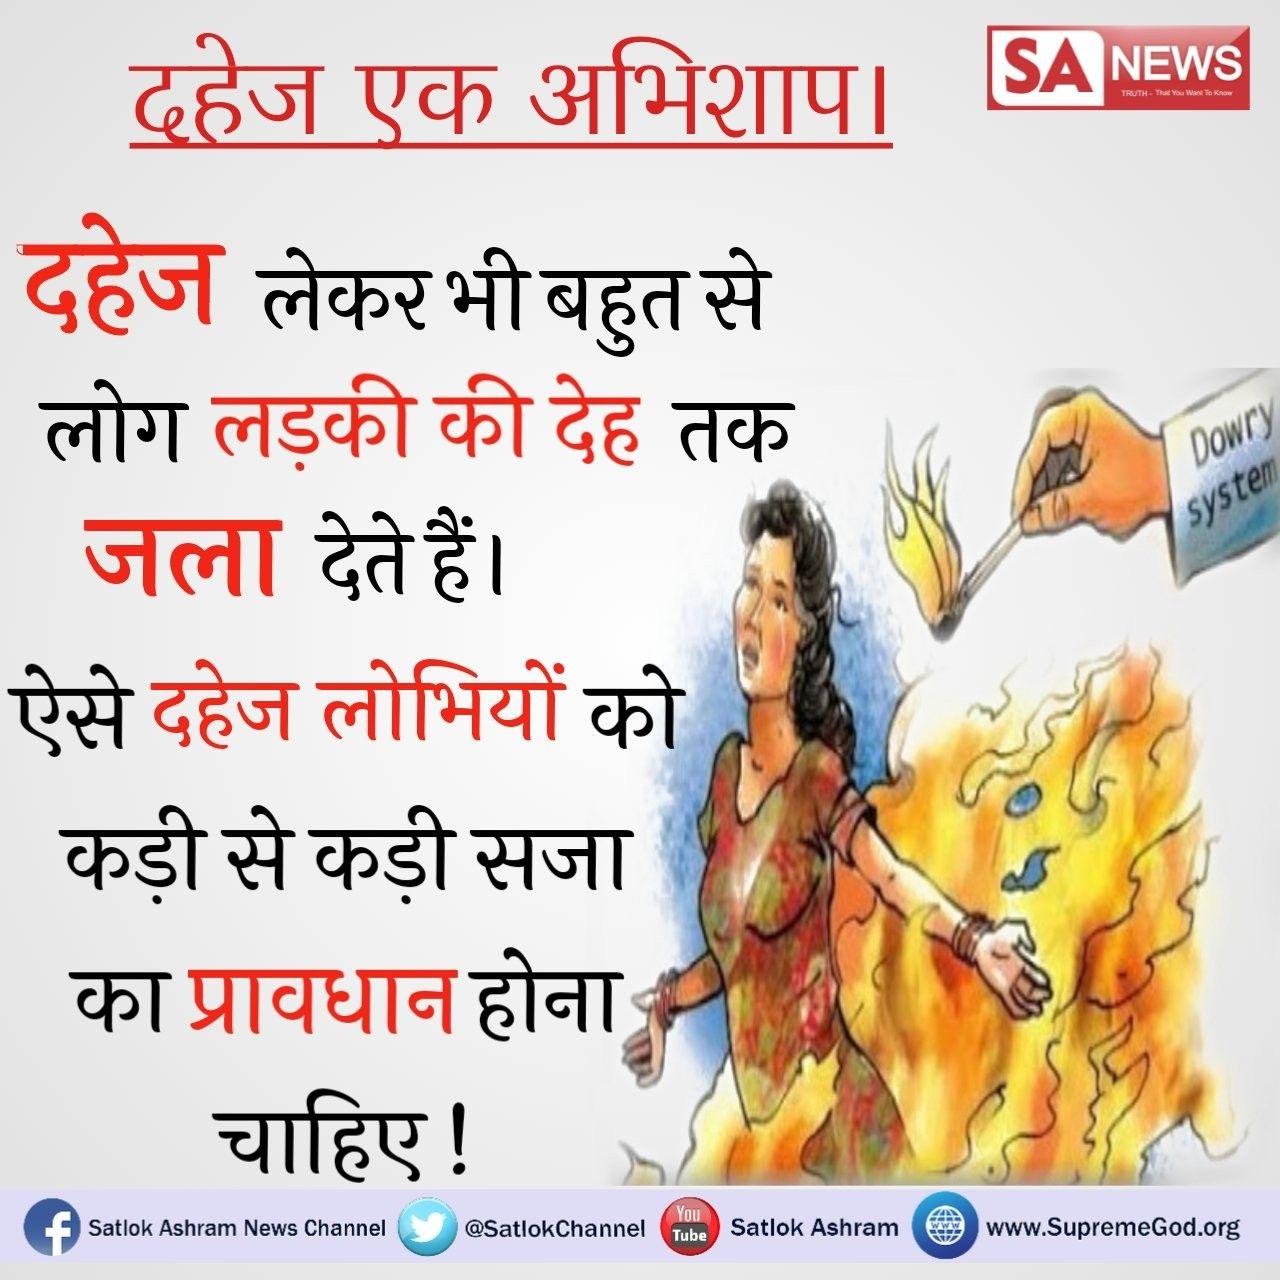 Pin by Shrinivasrathod on shrinivas Spiritual quotes god